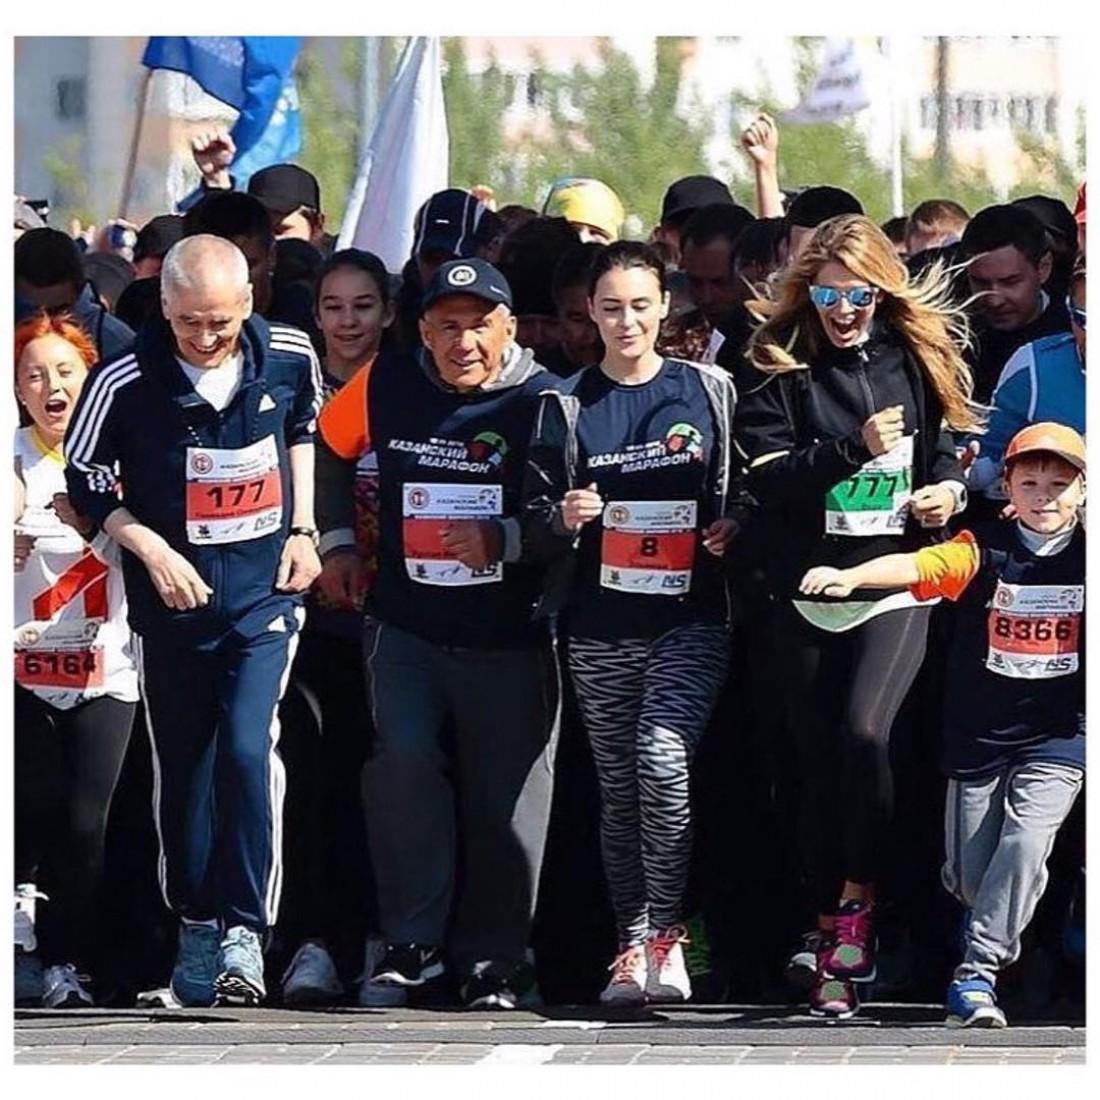 Вера Брежнева (справа) участвовала в марафоне